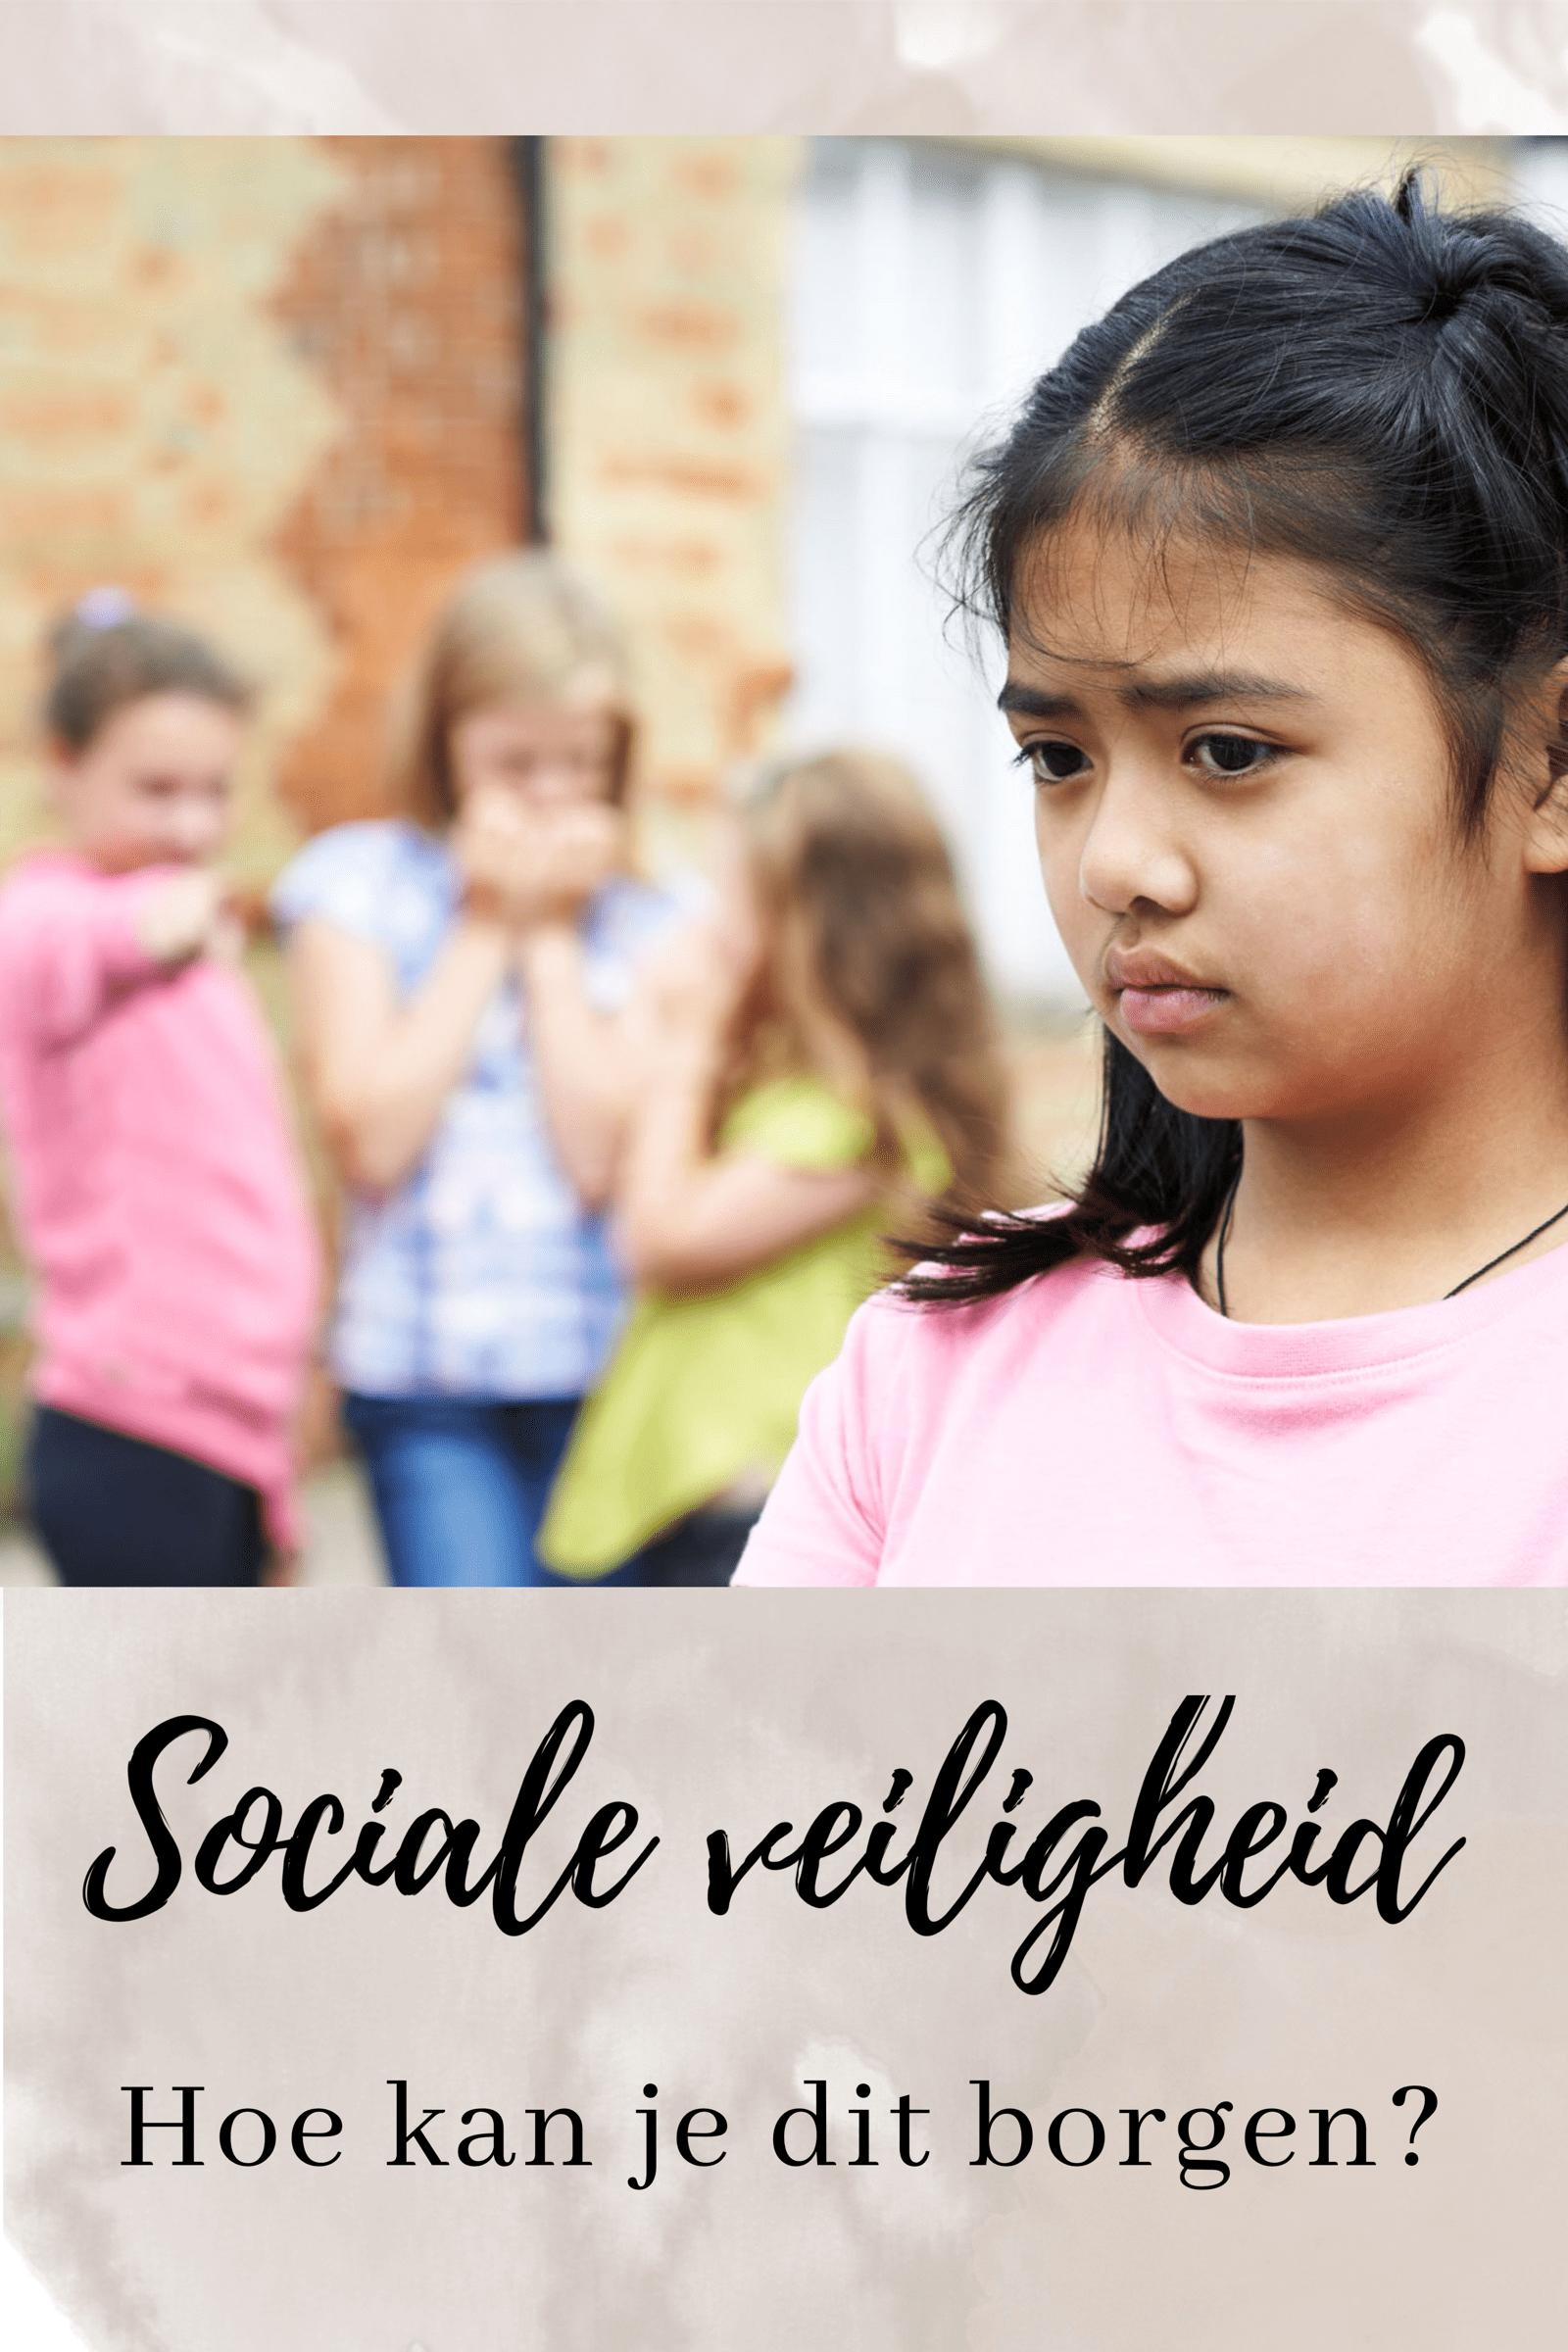 Sociale veiligheid: hoe kan je dit borgen?